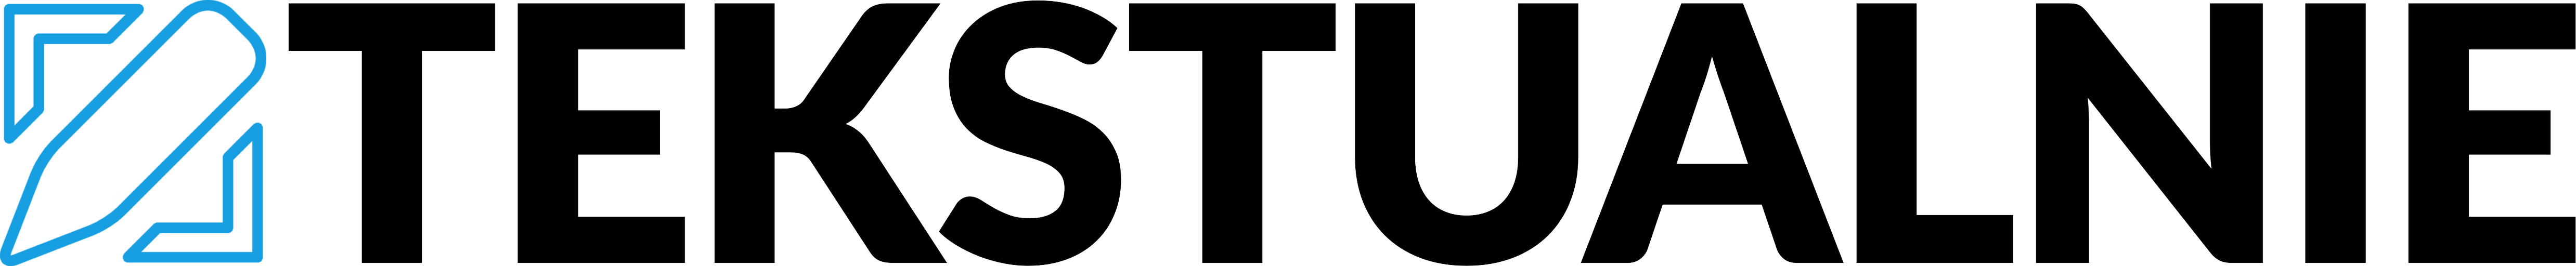 Logotyp-1